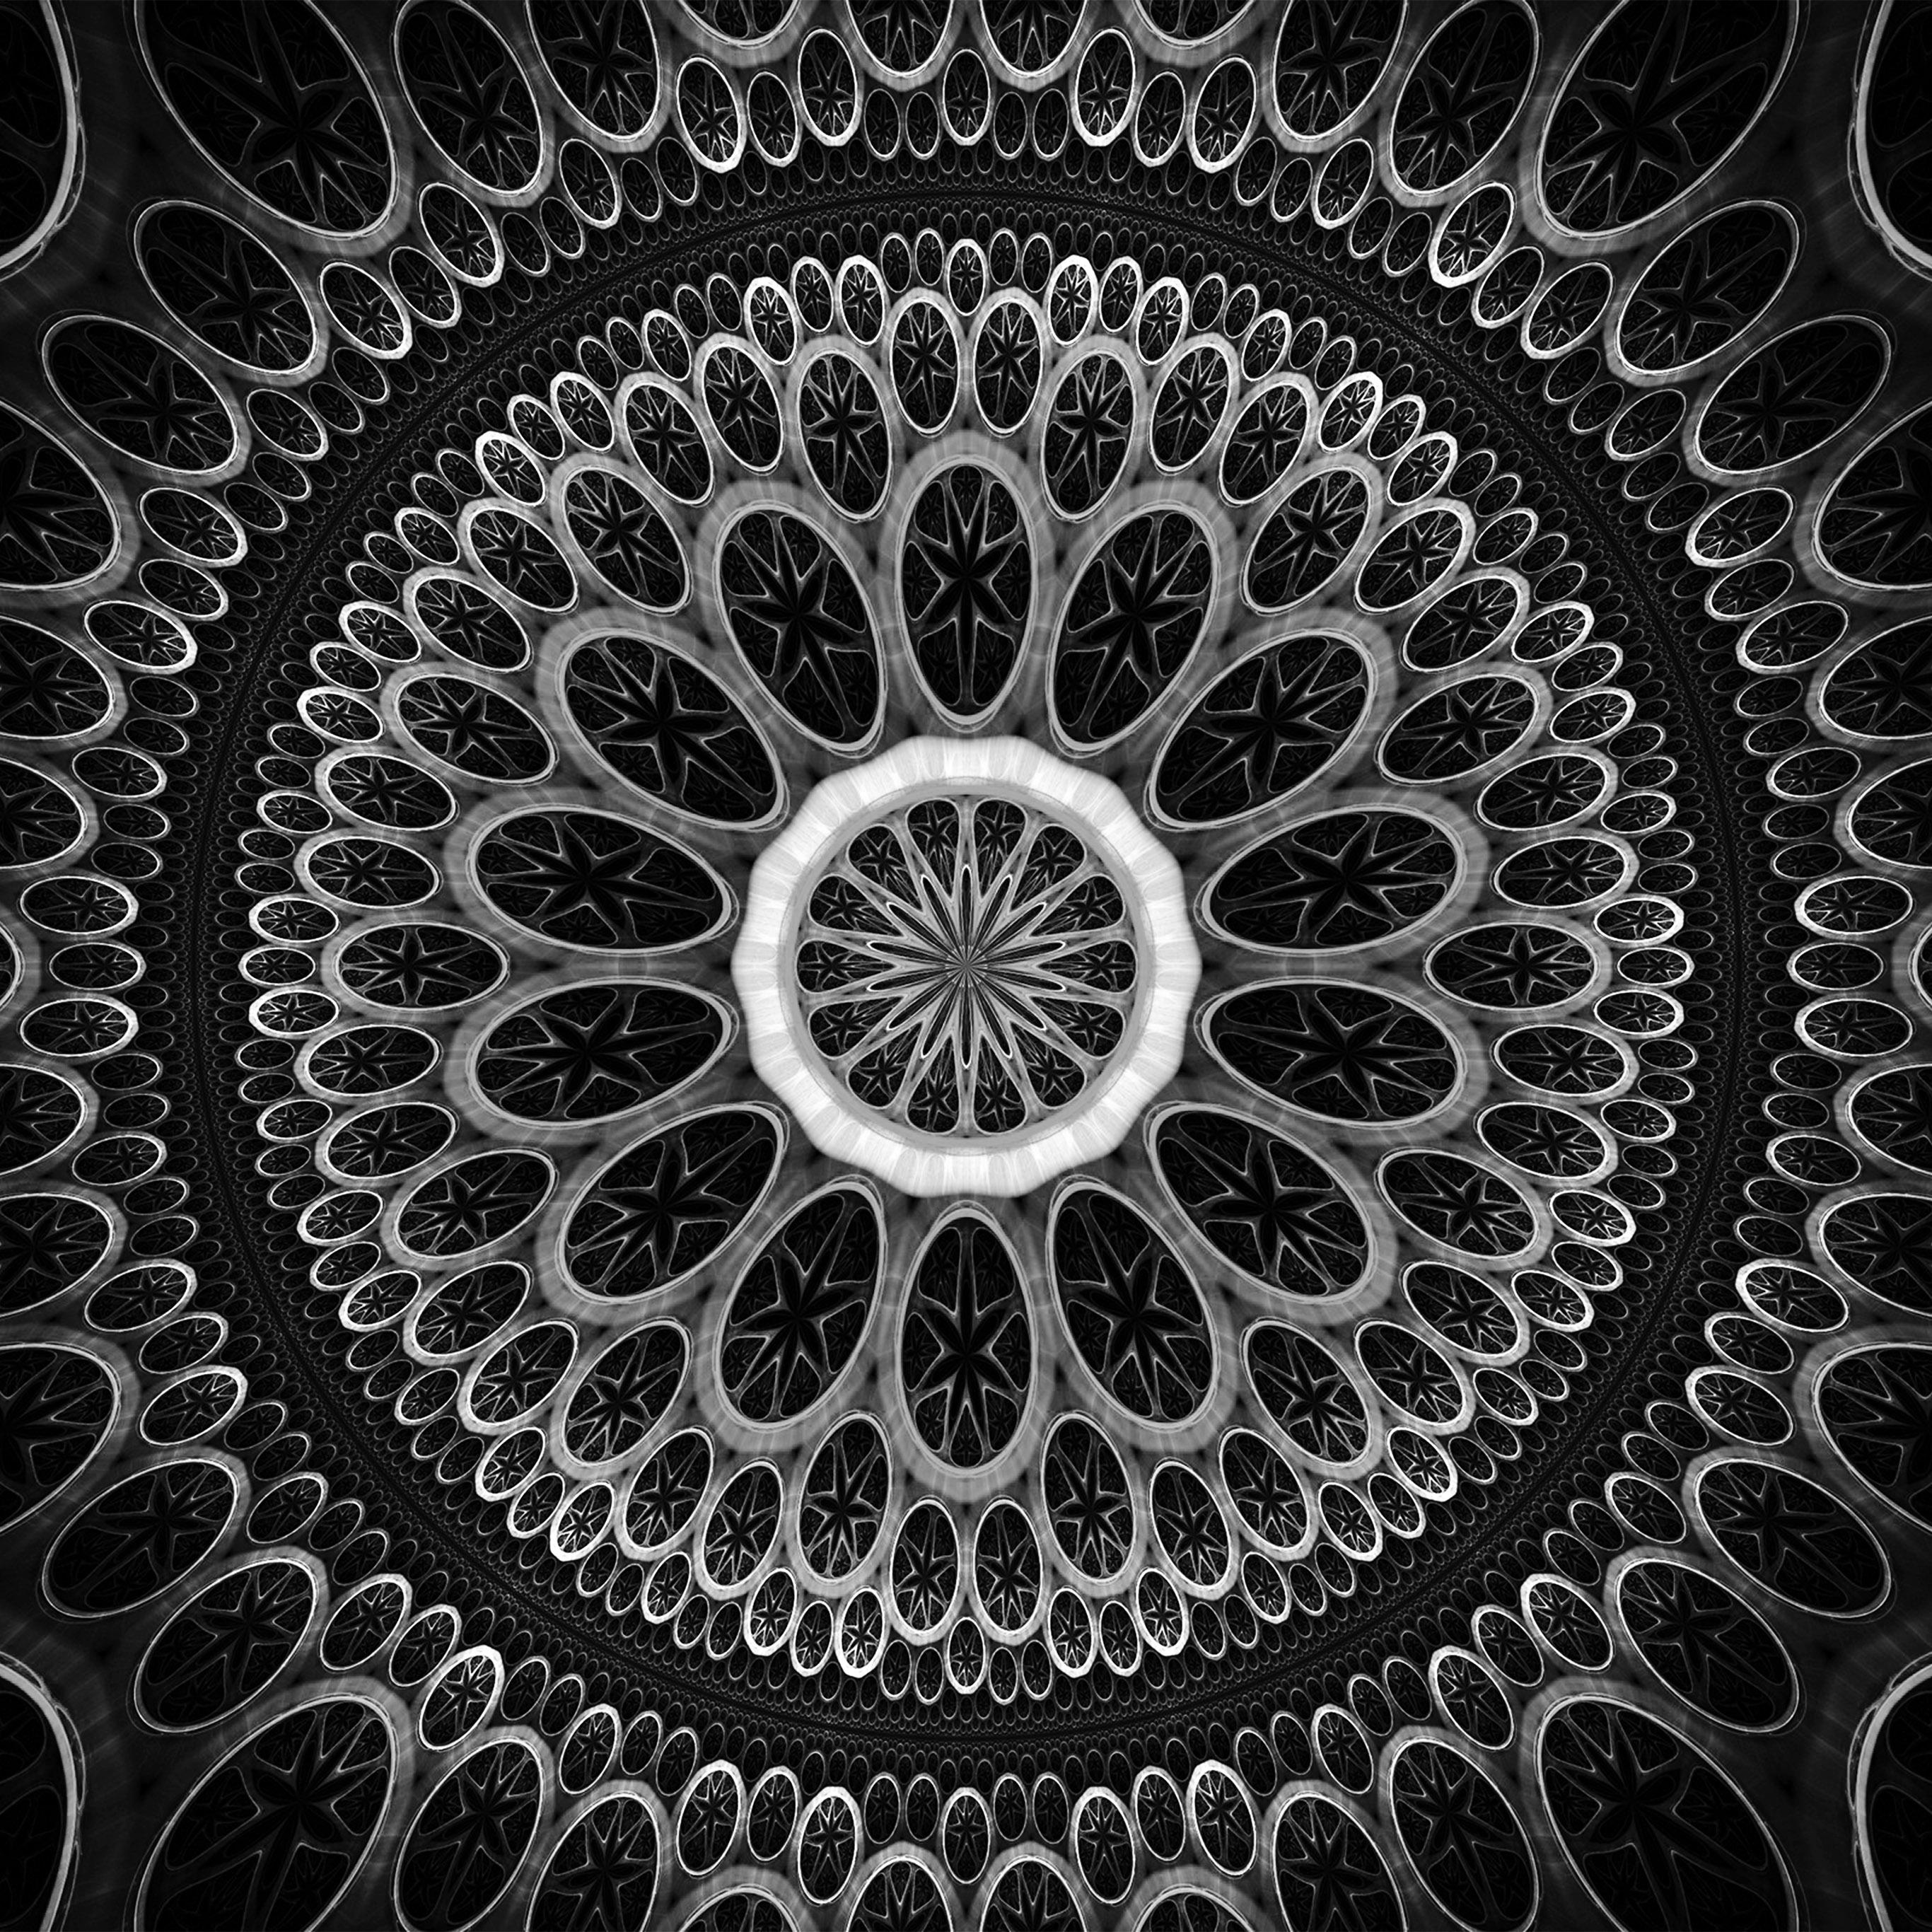 Vn10 Psychedelic Art Pattern Dark Bw Wallpaper